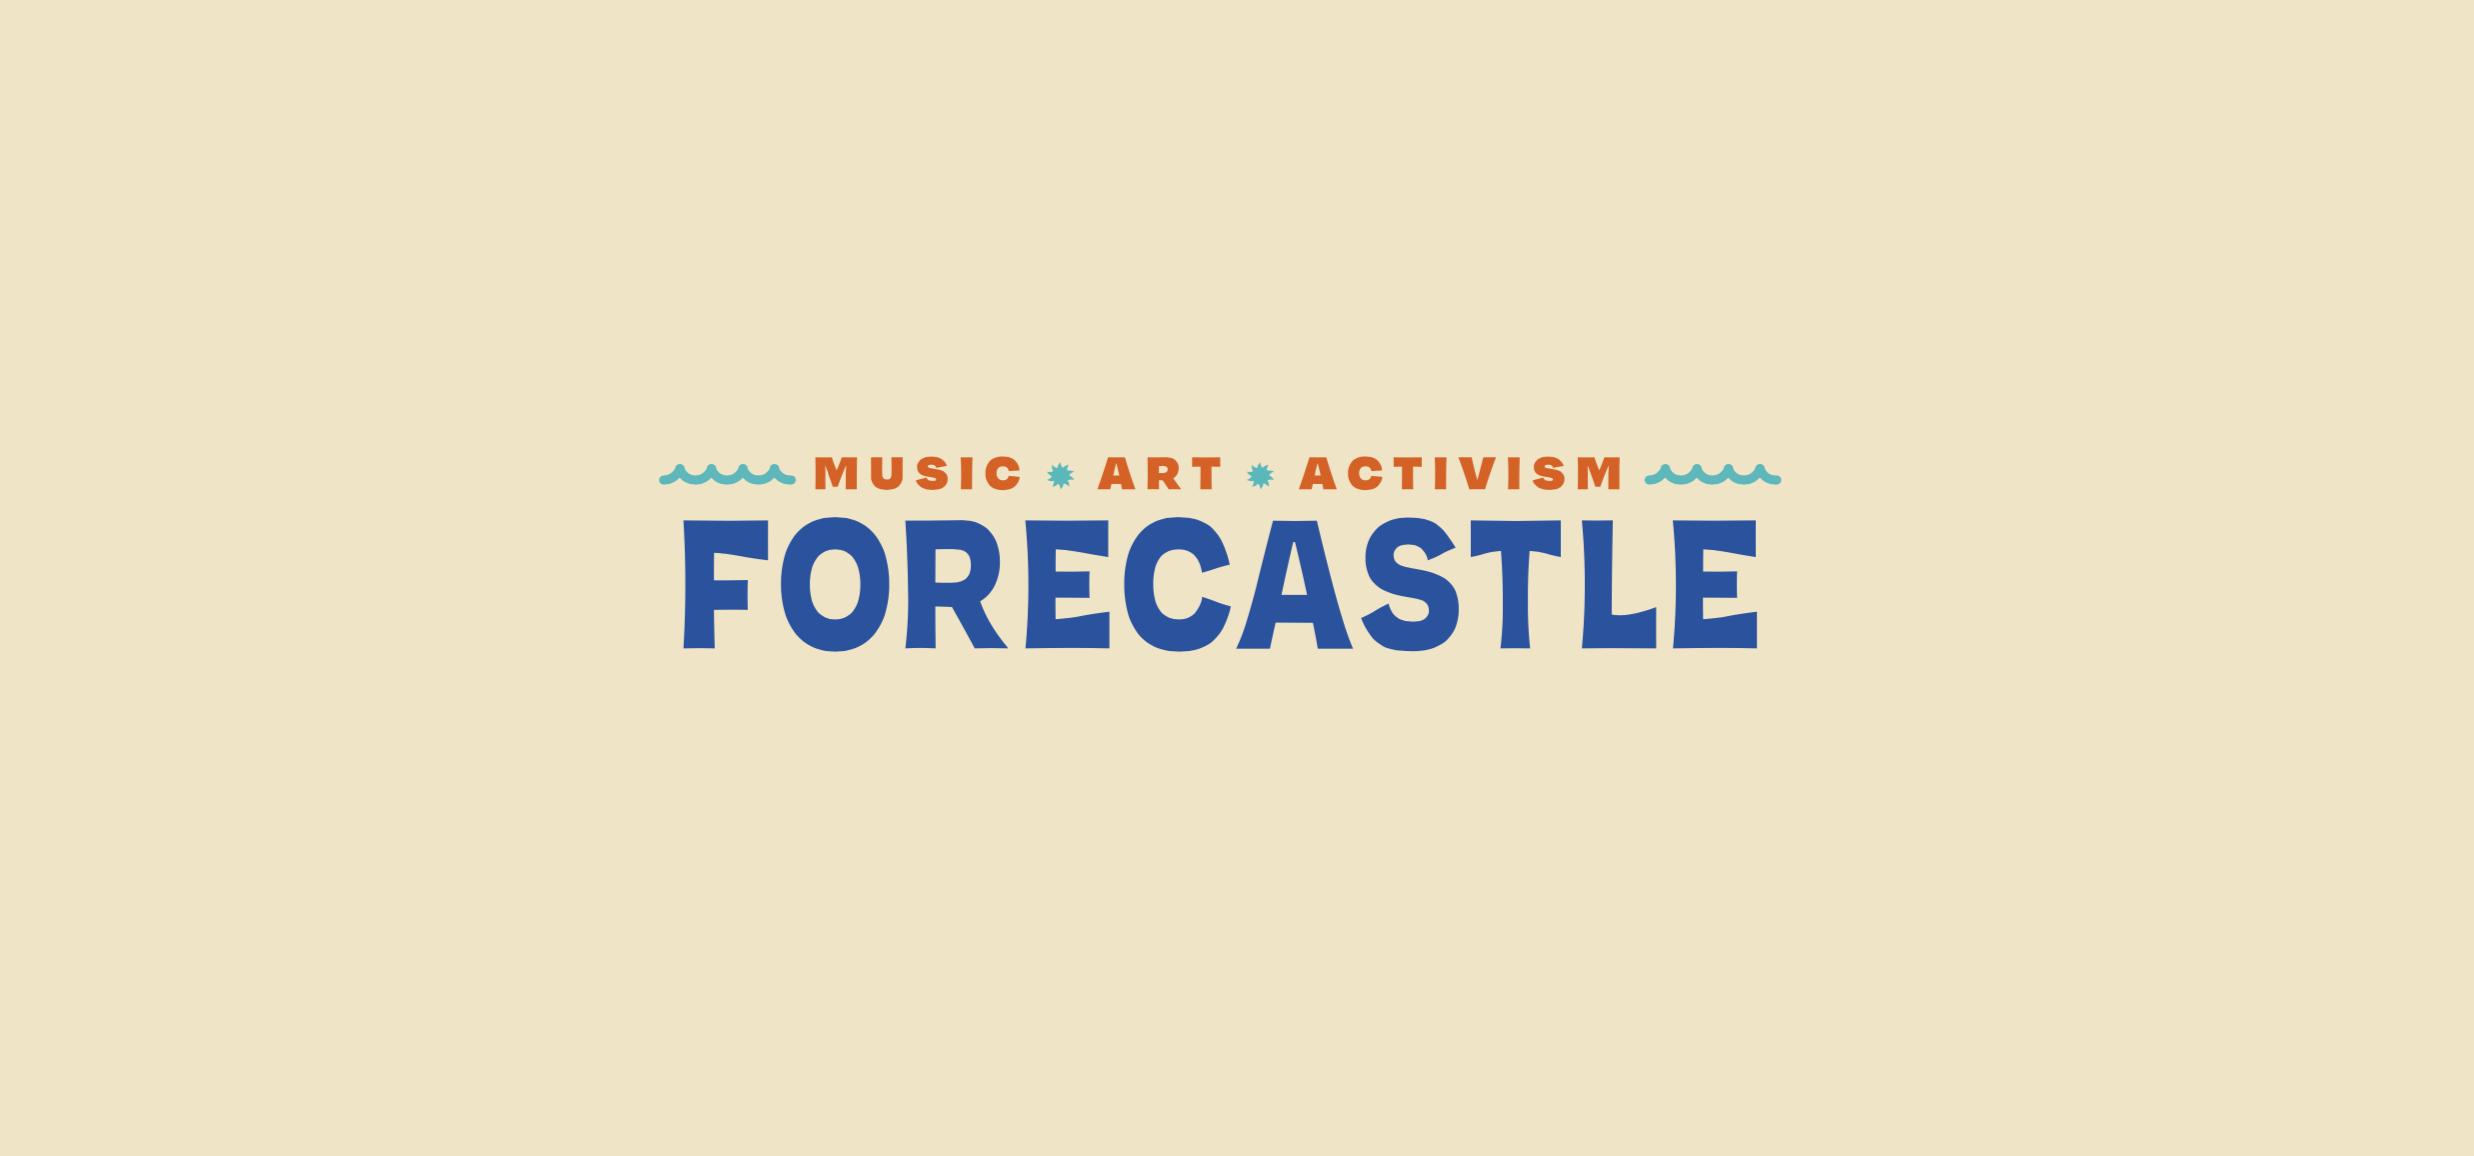 Forecastle Festival 2020.Tickets Forecastle Festival July 17 19 2020